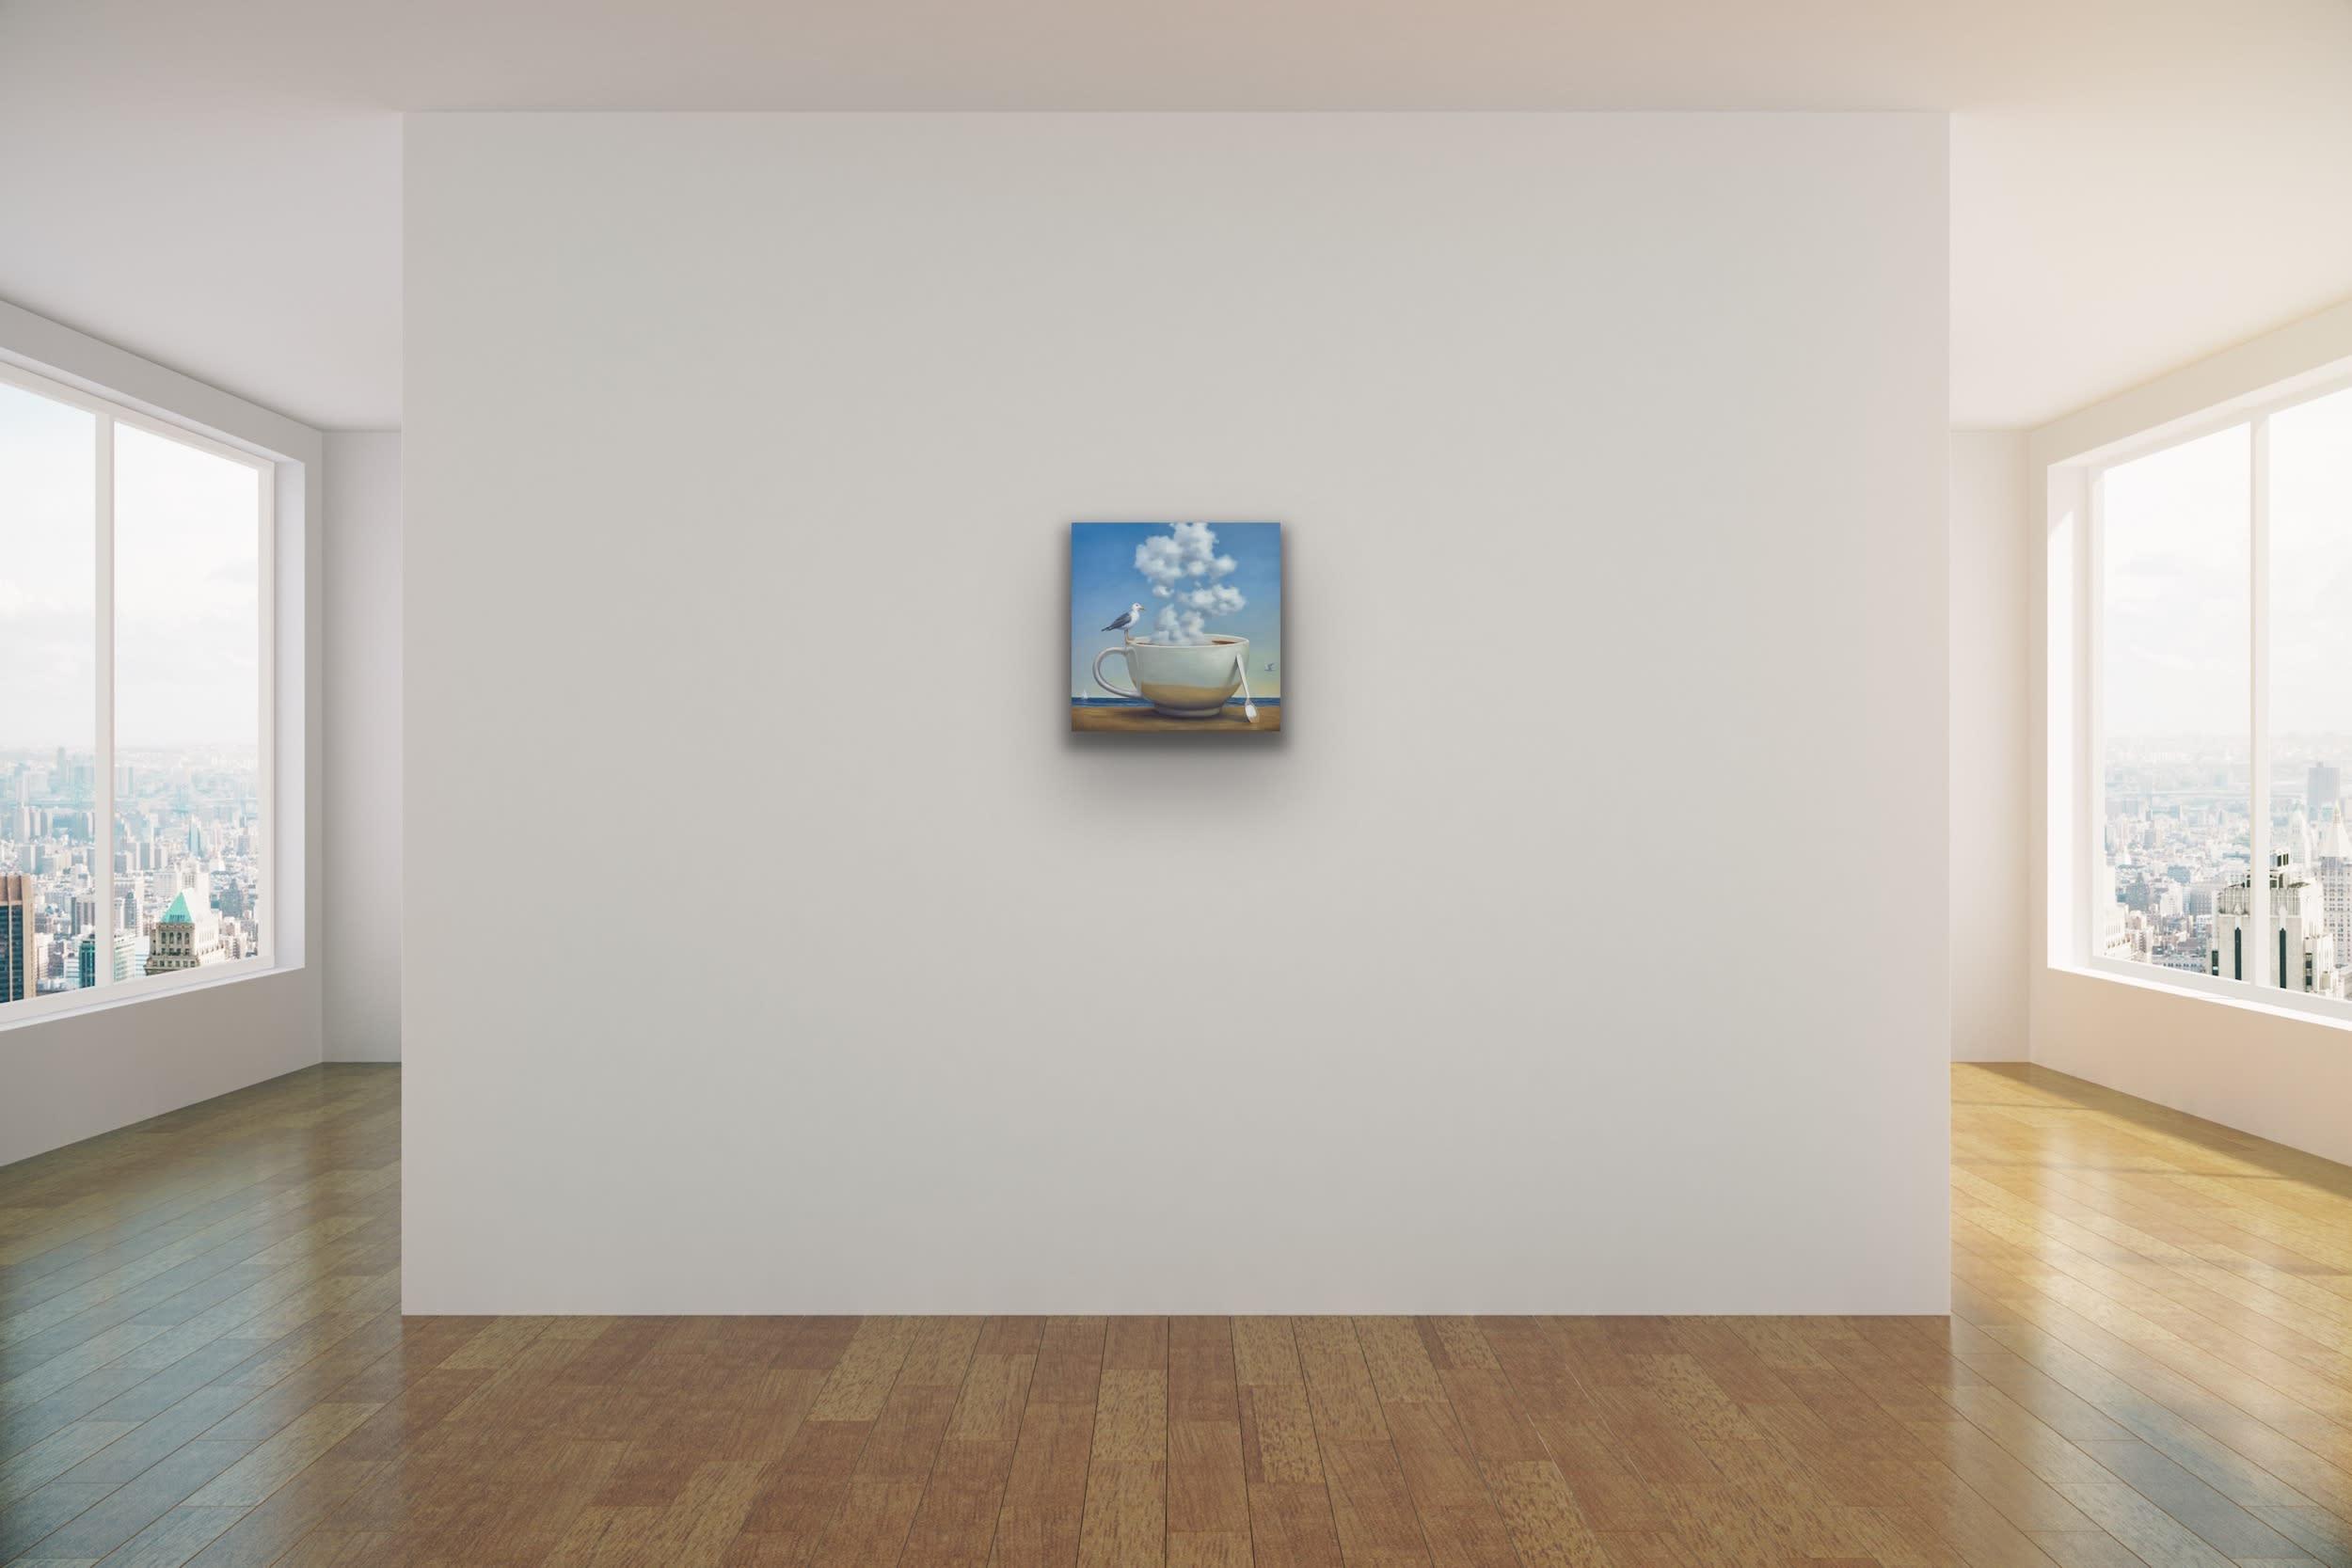 <div class='title'>           Paul Bond   Magical Surreal Absurd Art Vladimir Kush Michael Cheval Dali Evo Art Maui 4         </div>